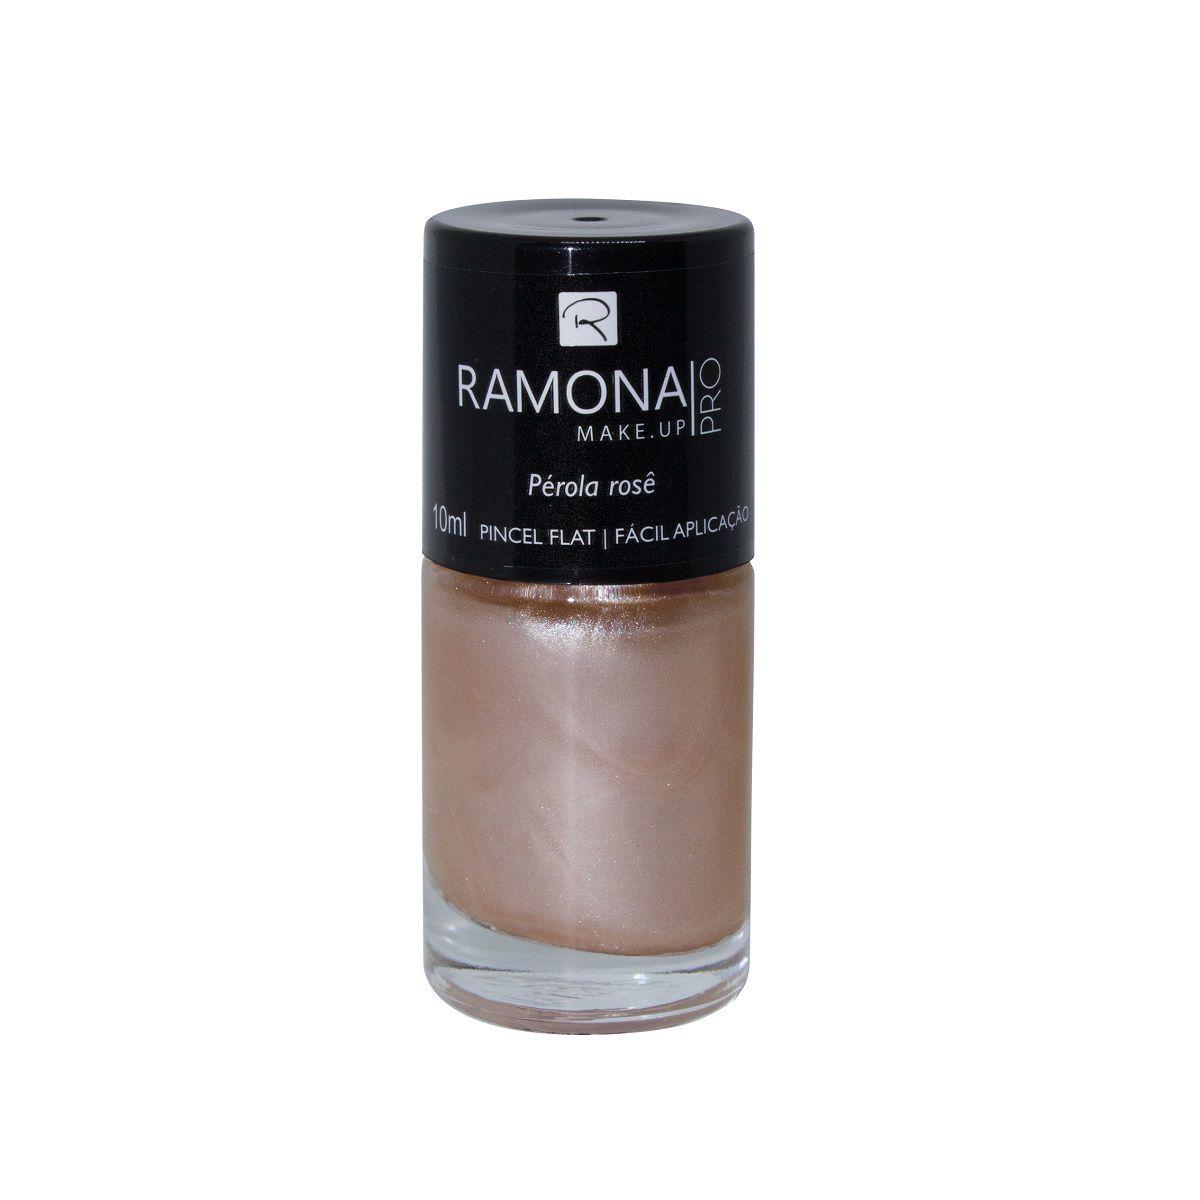 Esmalte cintilante Ramona Cosméticos Pérola Rose 10ml